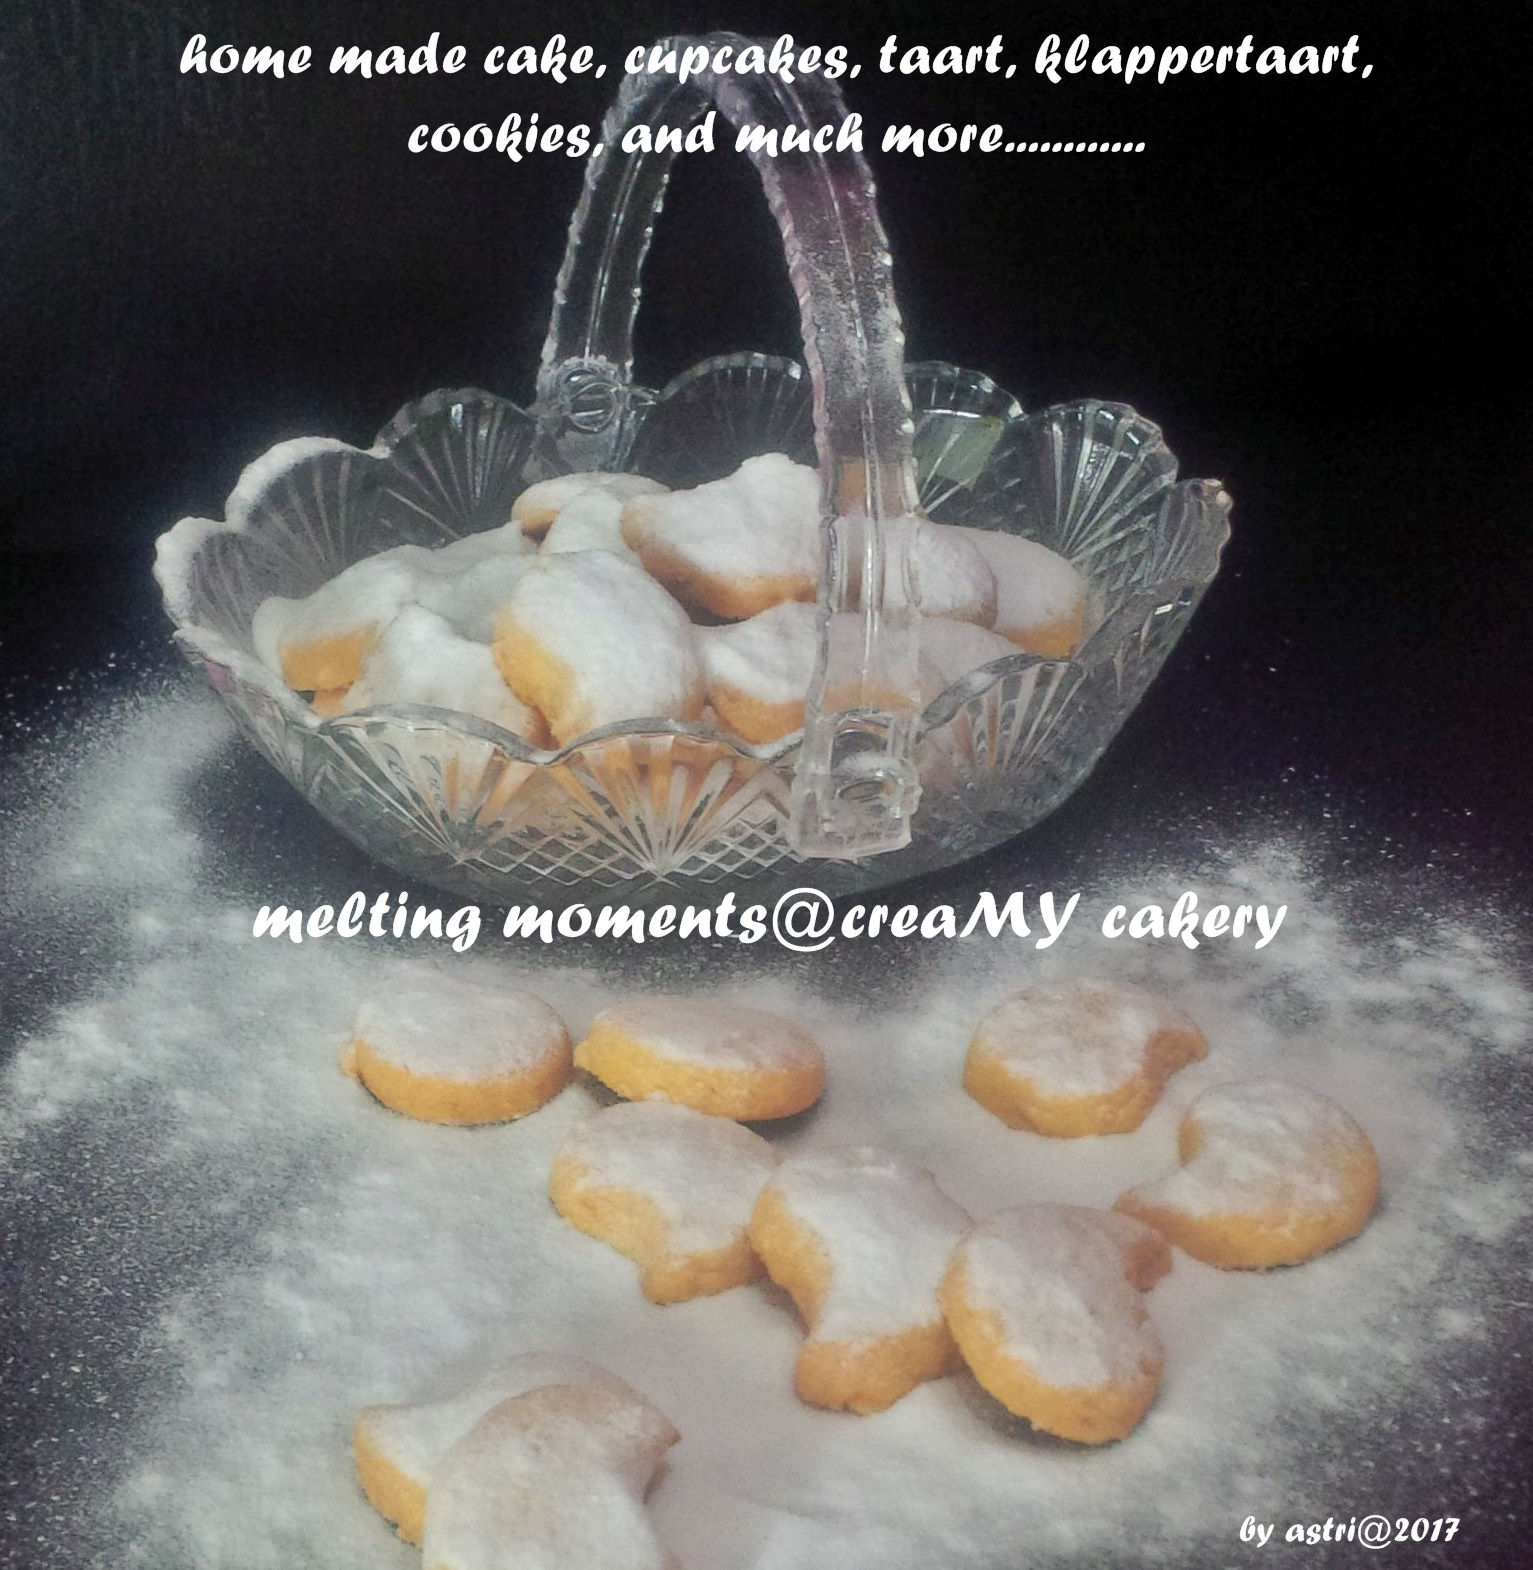 Creamy Cakery 2017 Sambel 200gr By Dapur Liwet Ui Foto Diambil Seadanya Dan Sesempatnya Hehehehe